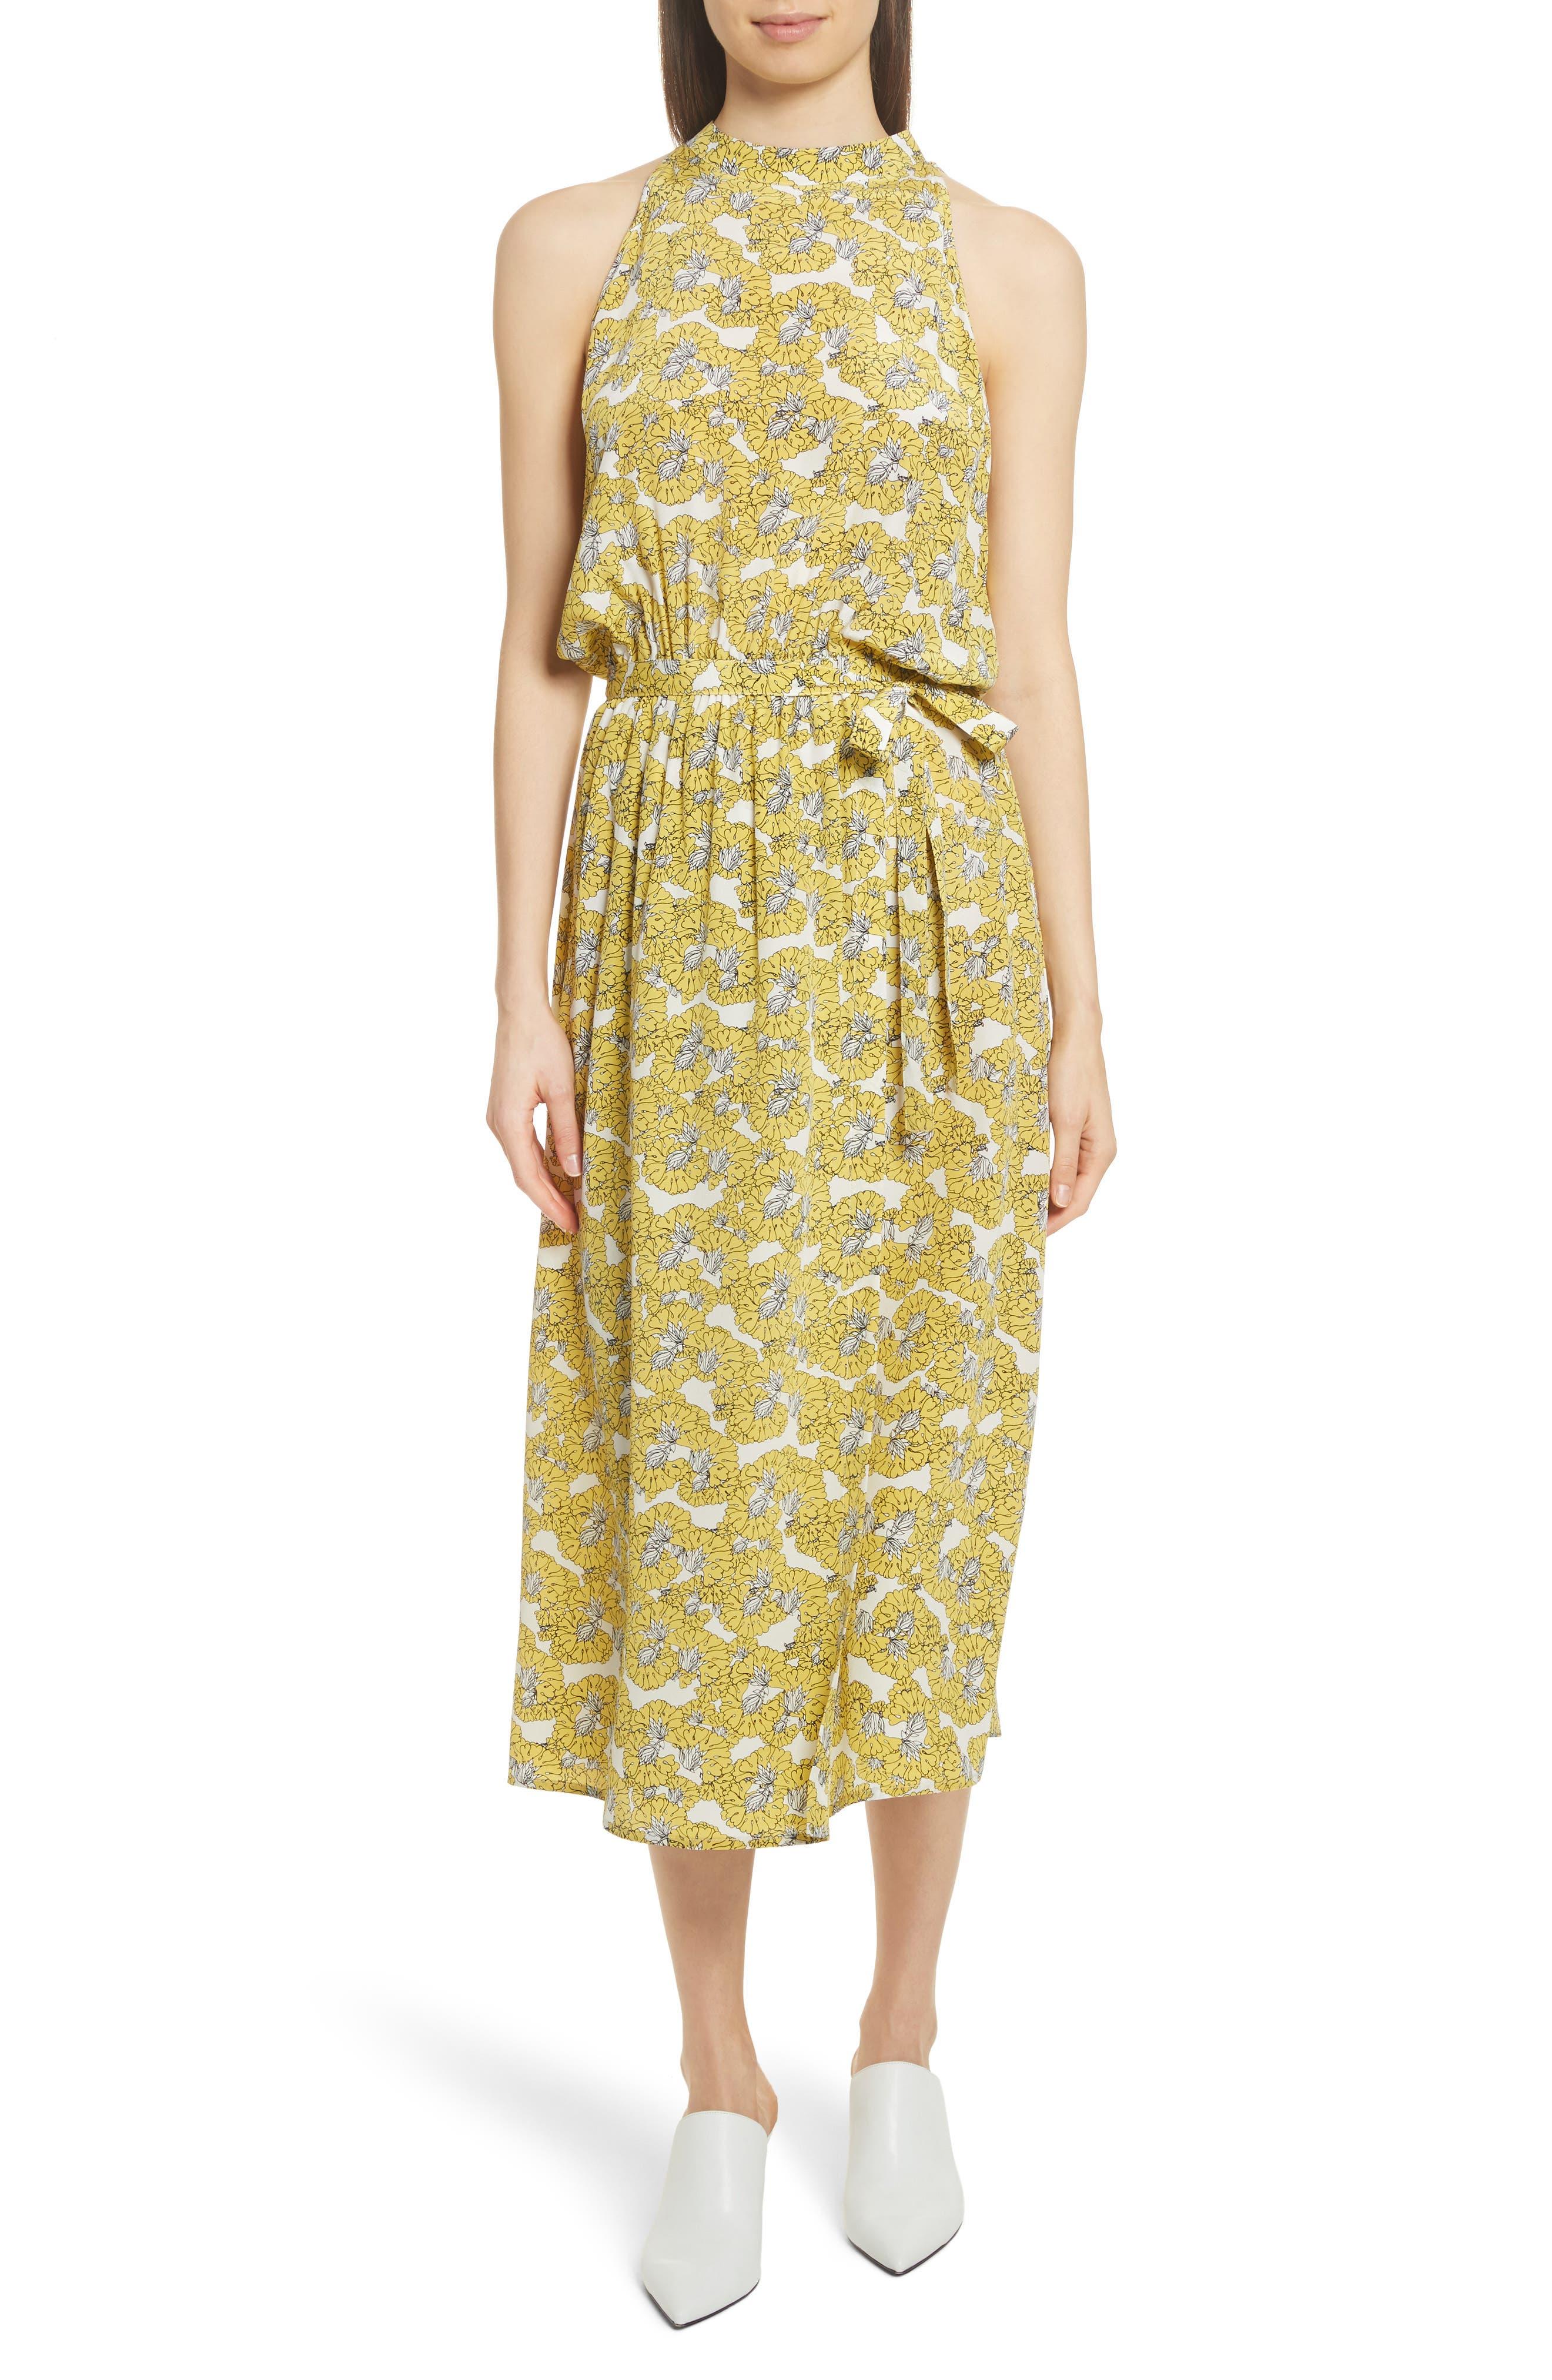 Dania Floral Print Dress,                         Main,                         color, 730